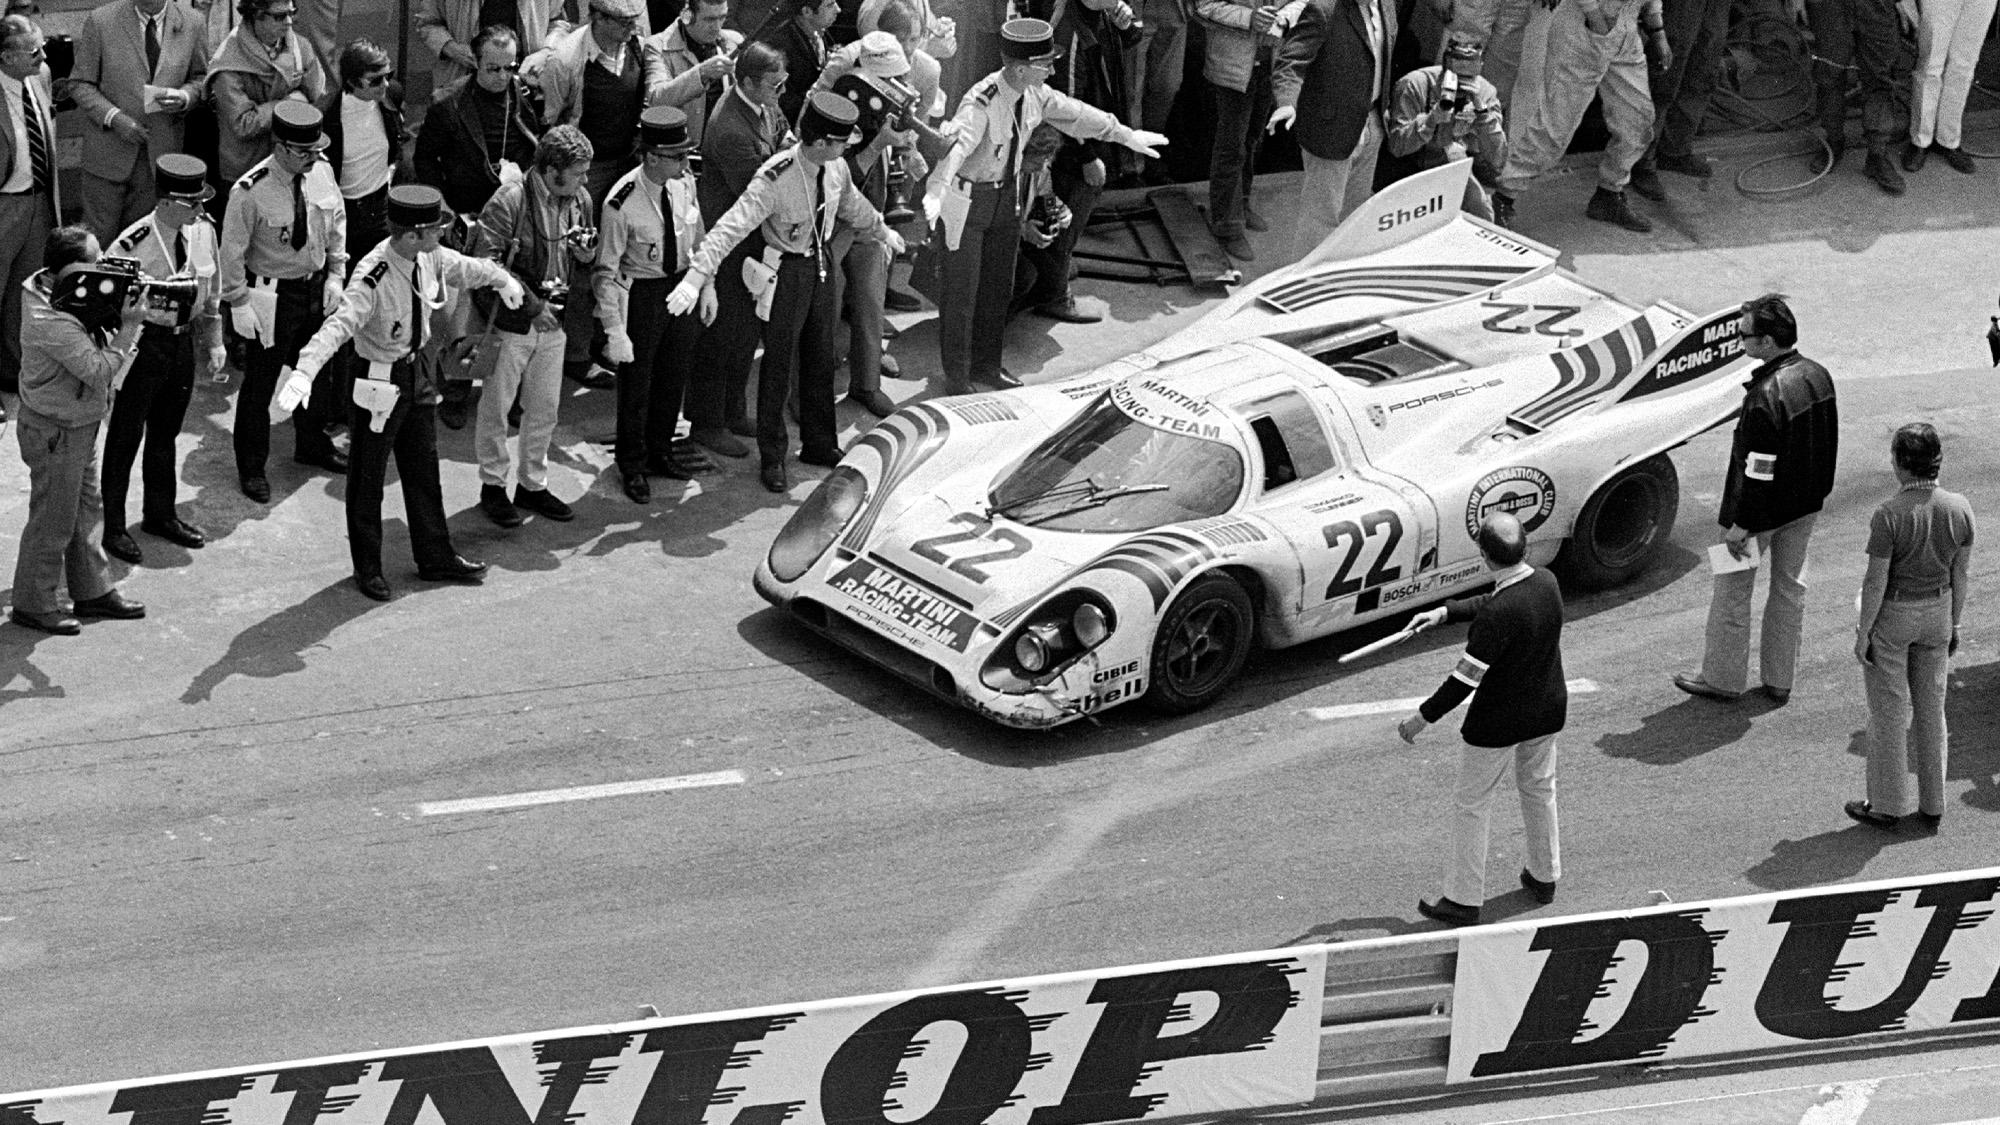 Martini Porsche 917 leaving Le Mans pits in 1971